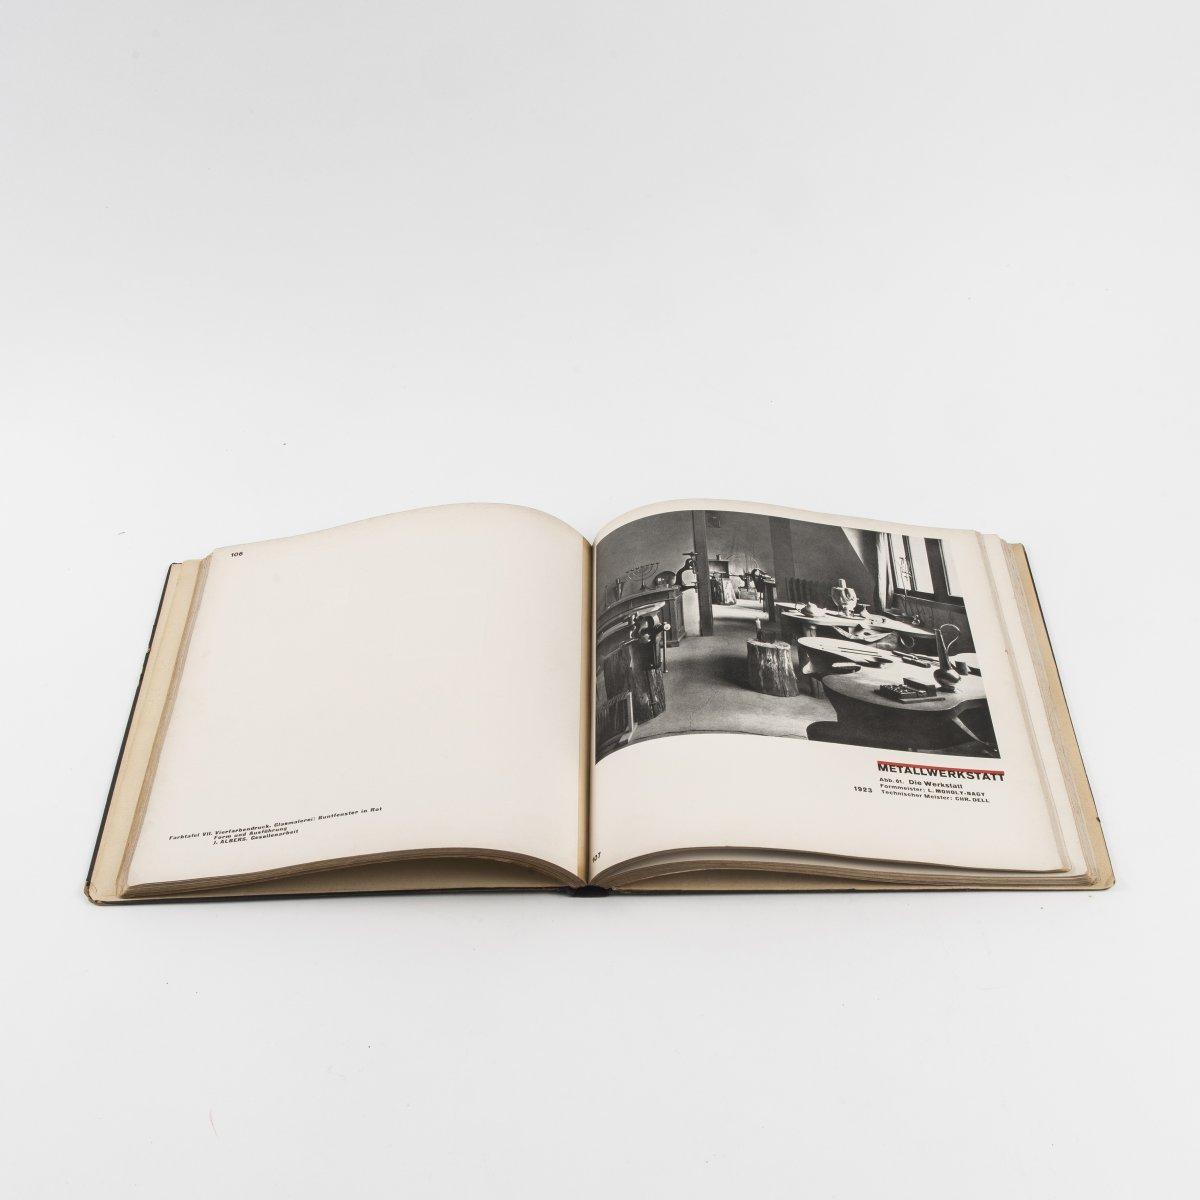 Los 6 - Herbert Bayer; László Moholy-Nagy, Katalog 'Staatliches Bauhaus in Weimar 1919 - 1923' Katalog '